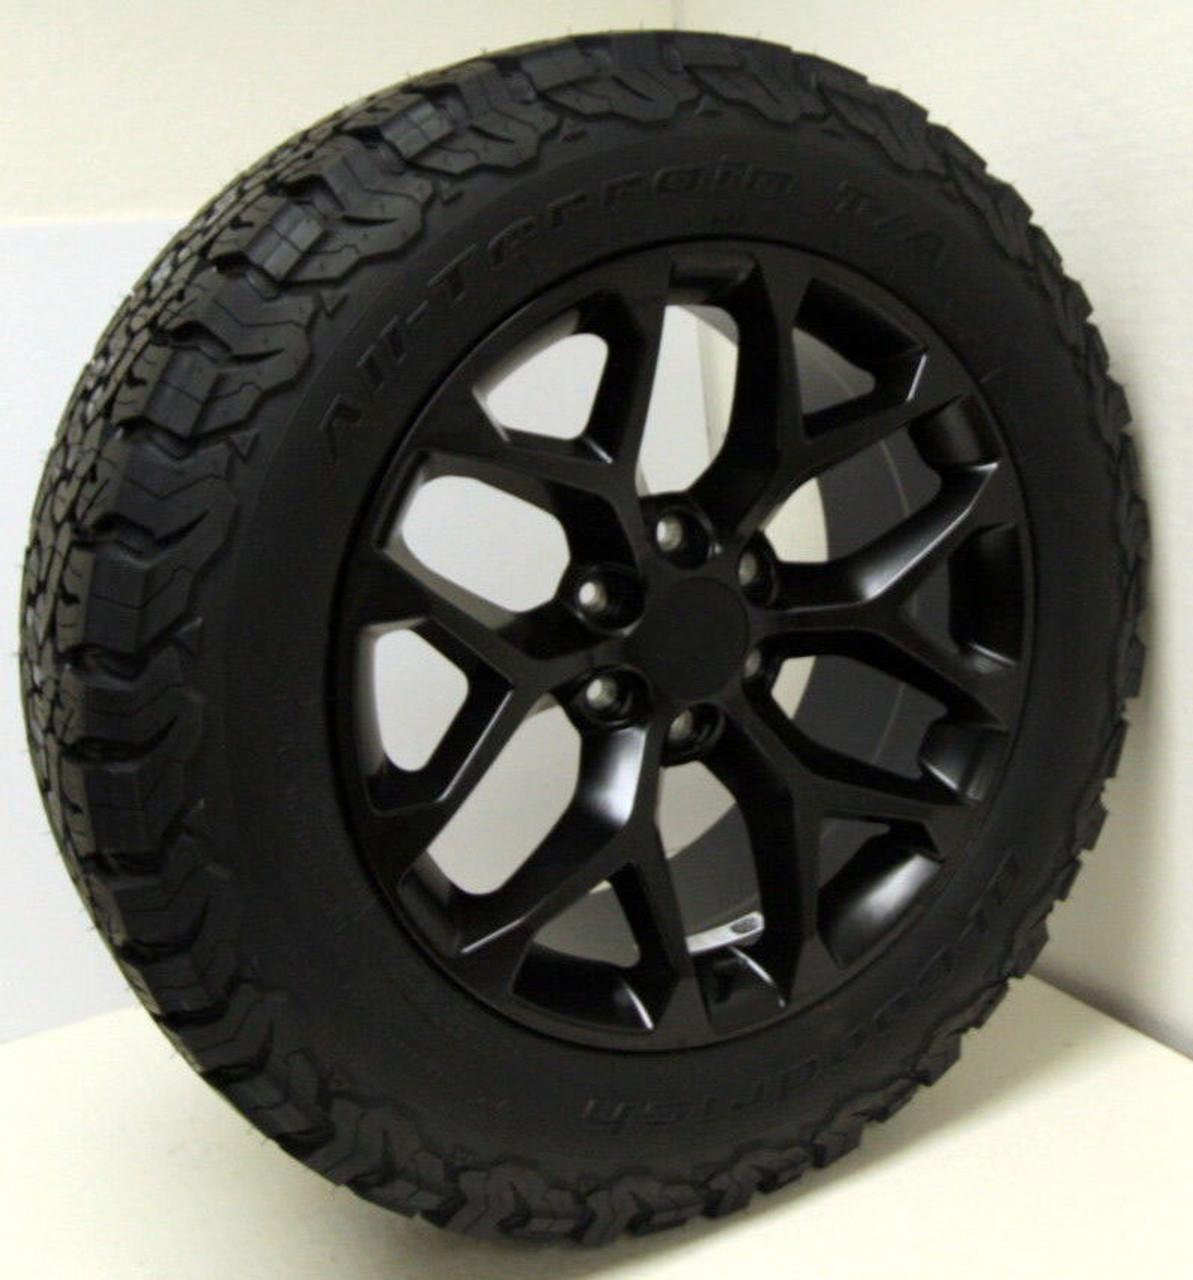 "Satin Matte Black 20"" Snowflake Wheels with BFG KO2 A/T Tires for GMC Sierra, Yukon, Denali - New Set of 4"